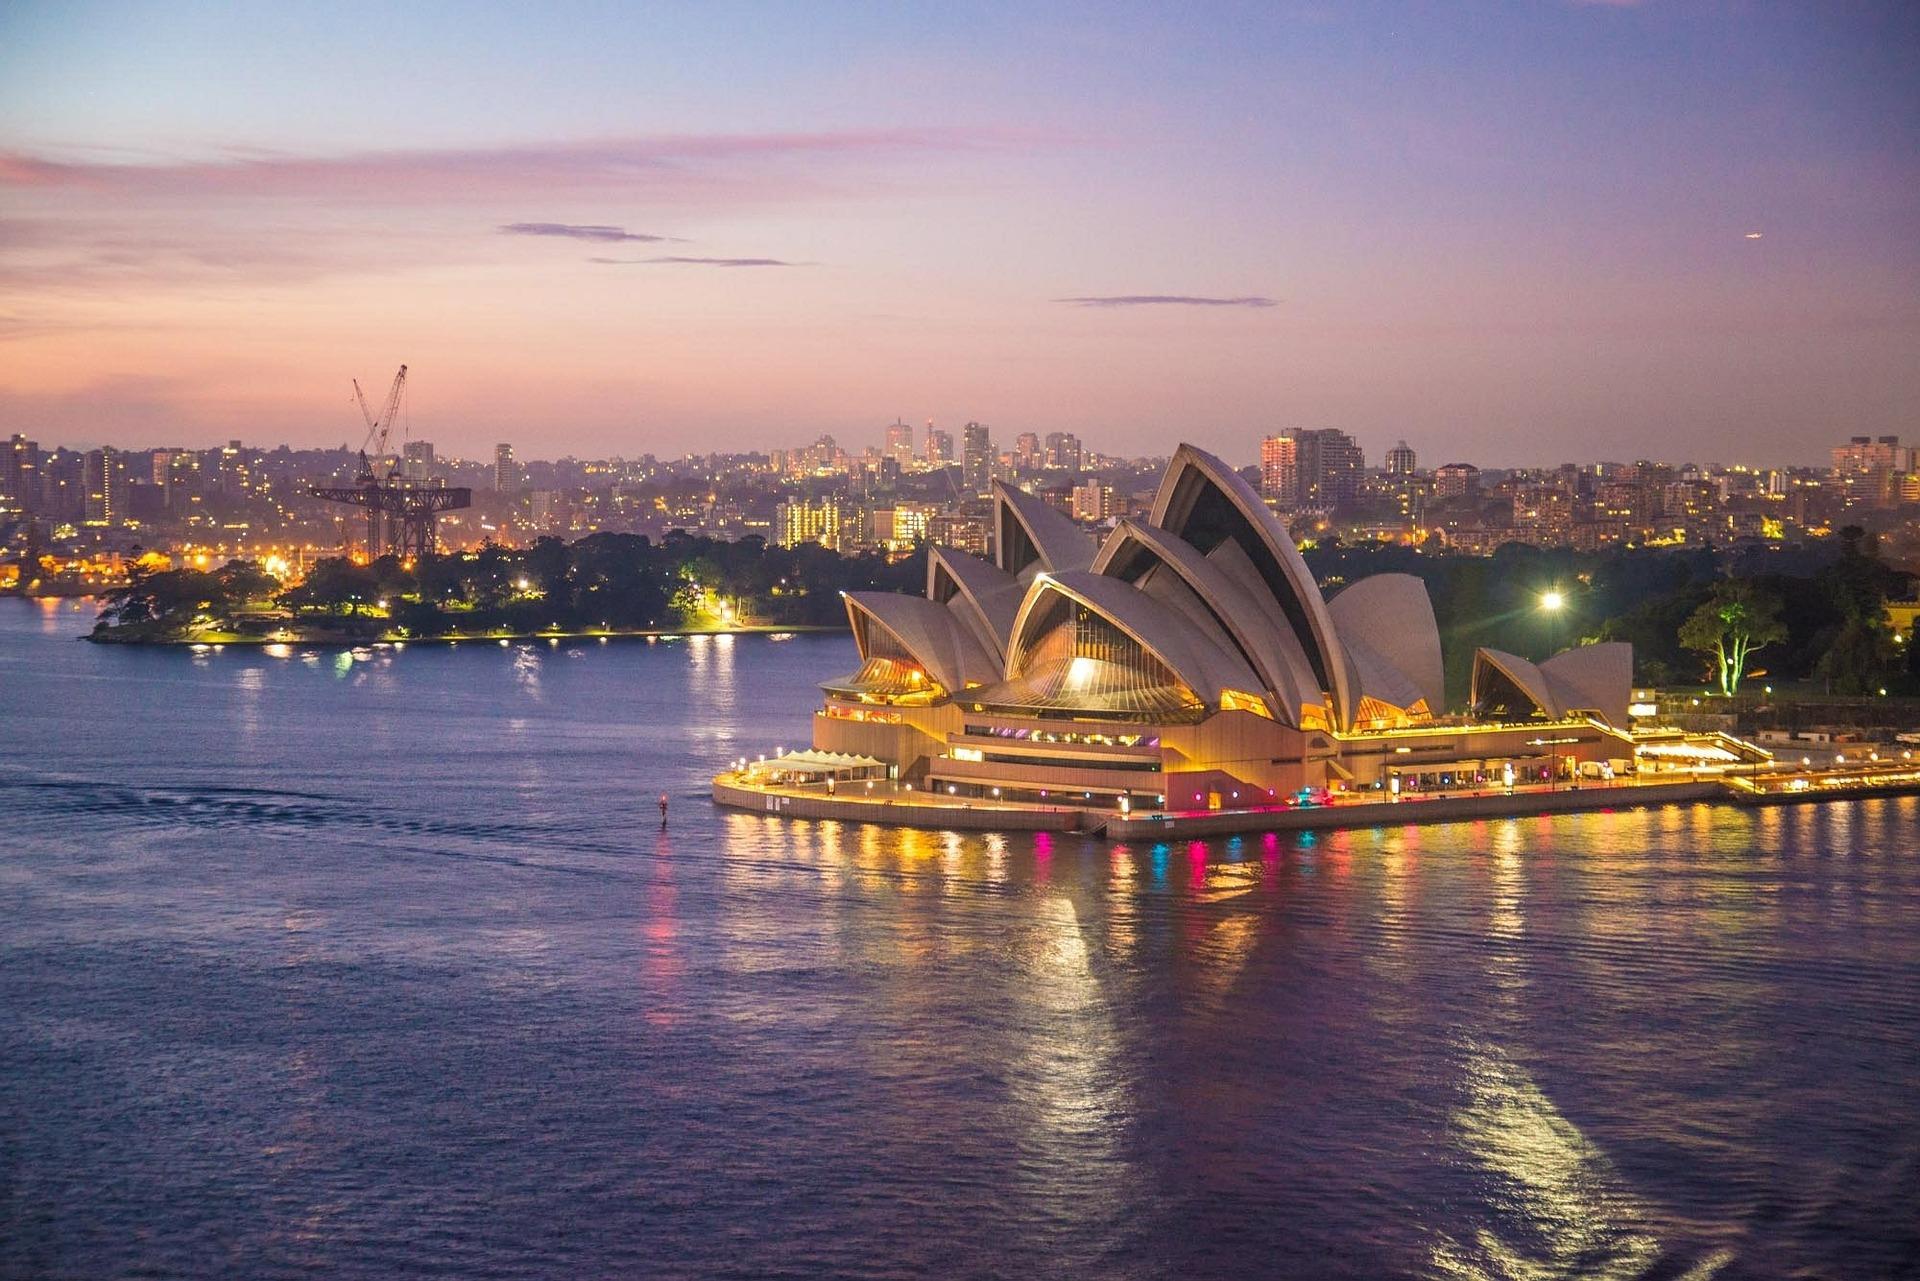 Dan državnosti BiH uvršten u multikulturalni kalendar Australije